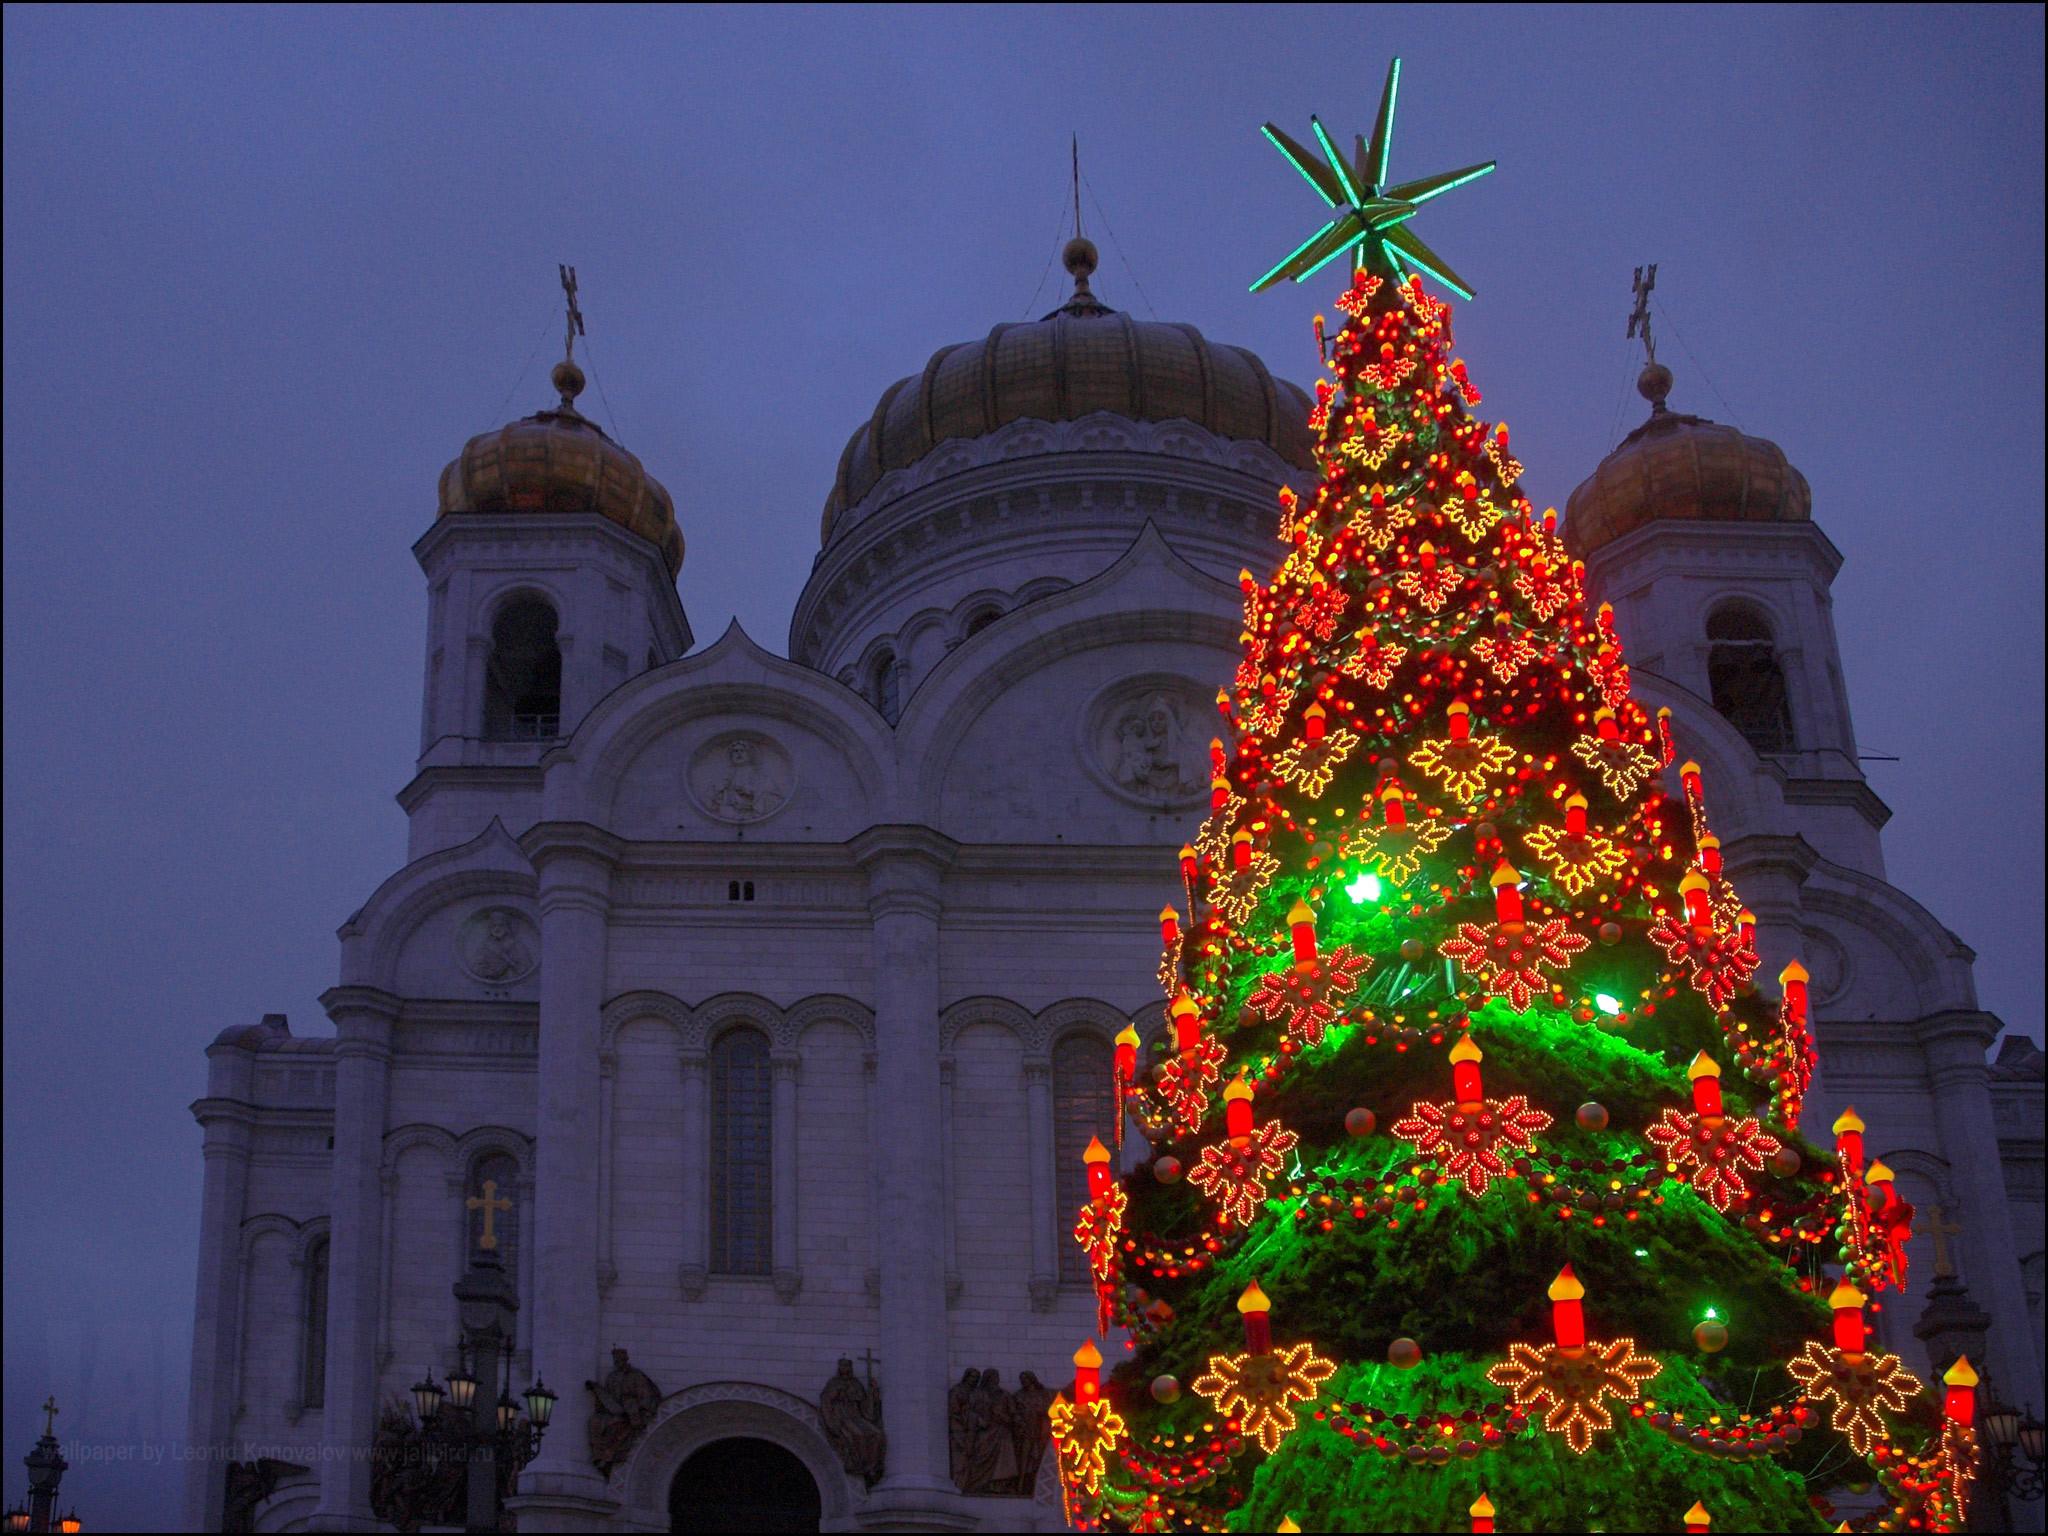 Тебя, рождество в россии картинки и фото